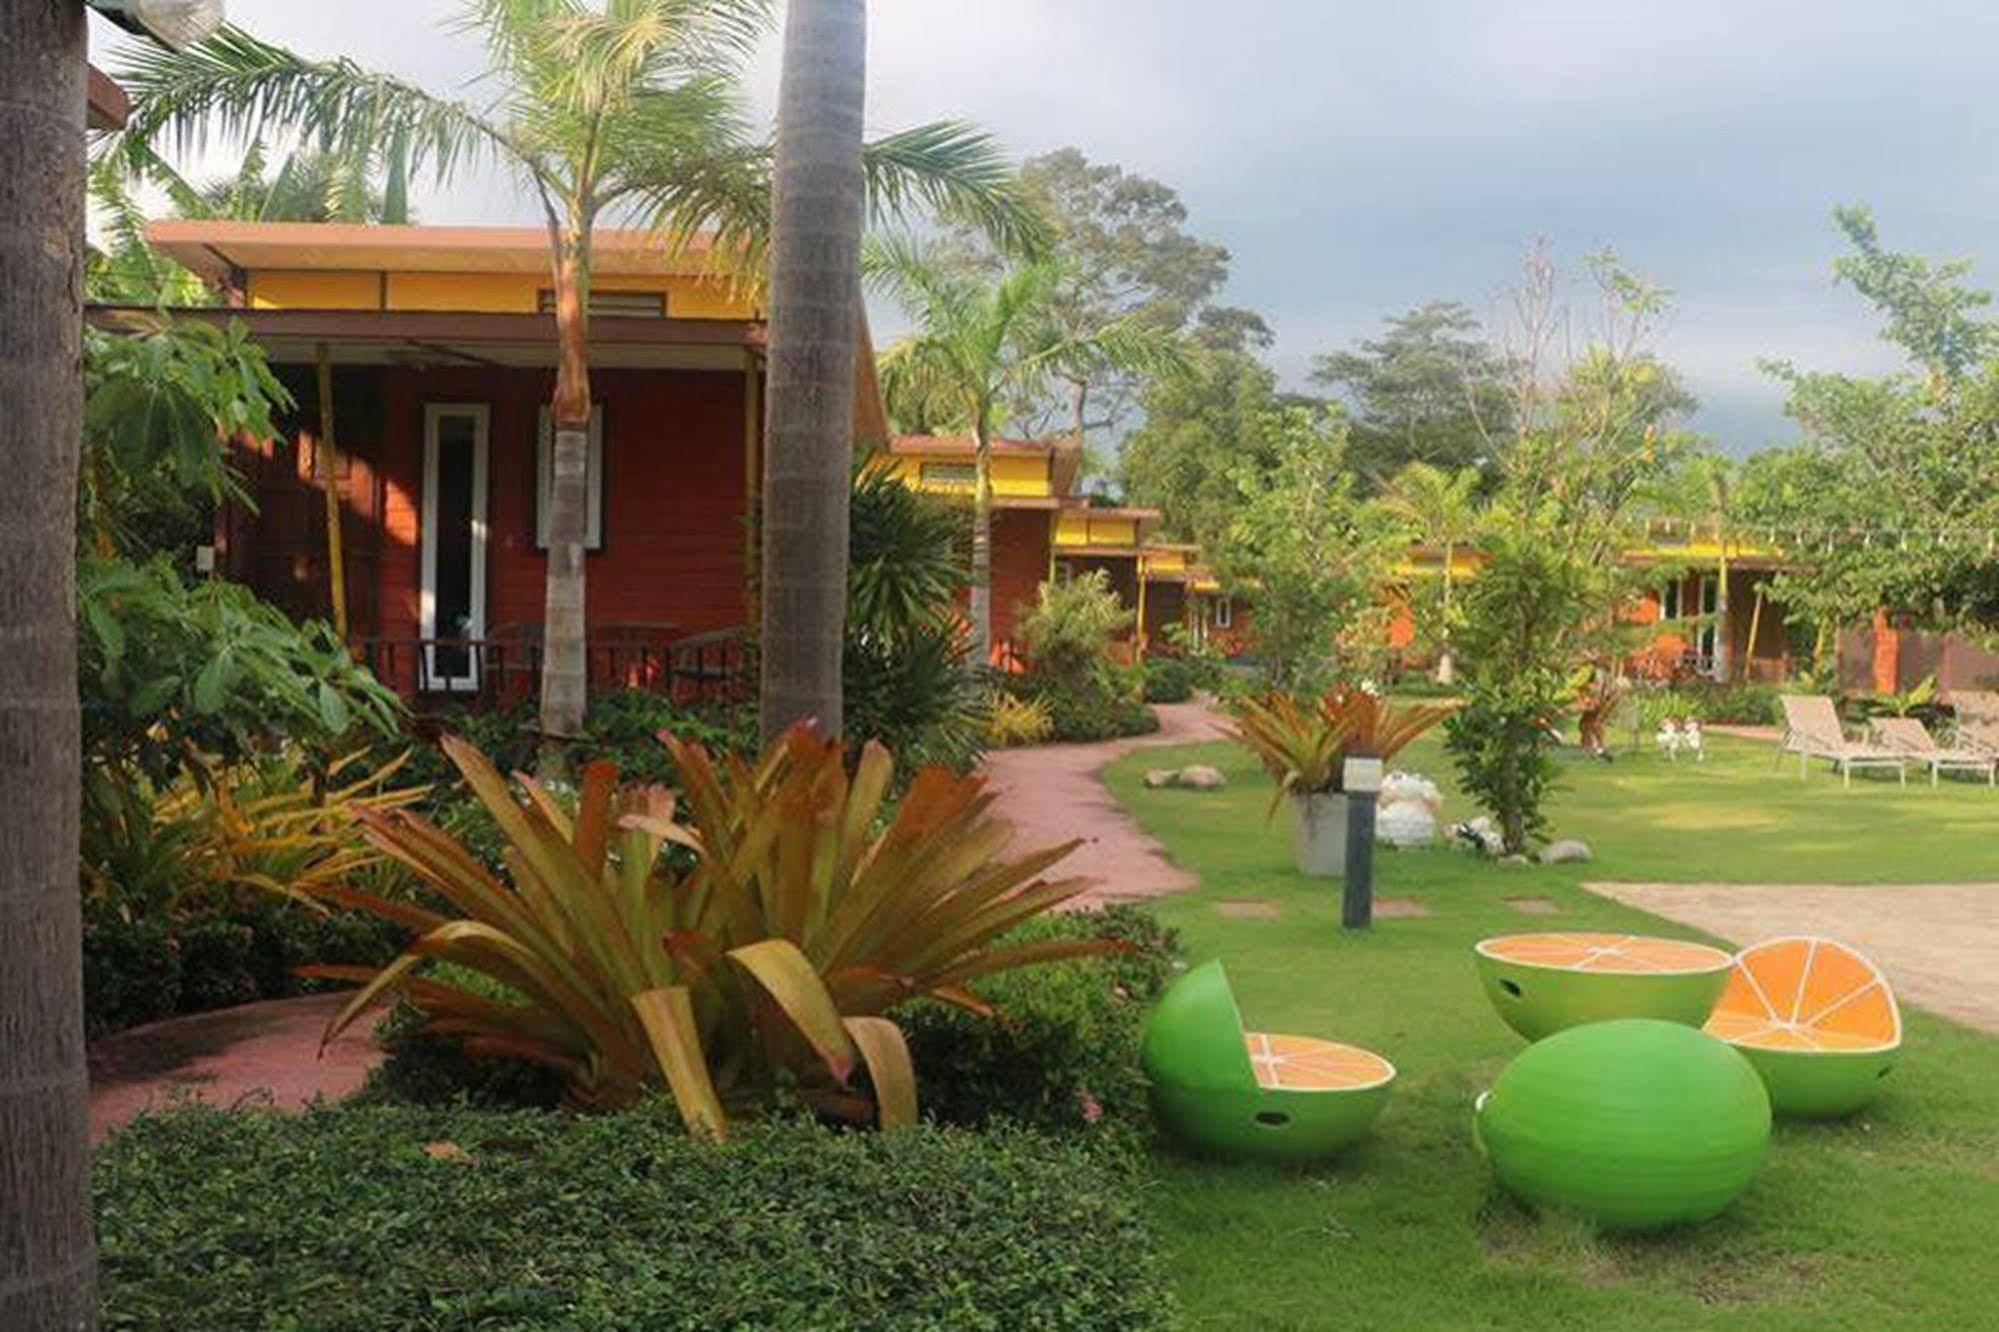 The Toy Art Resort